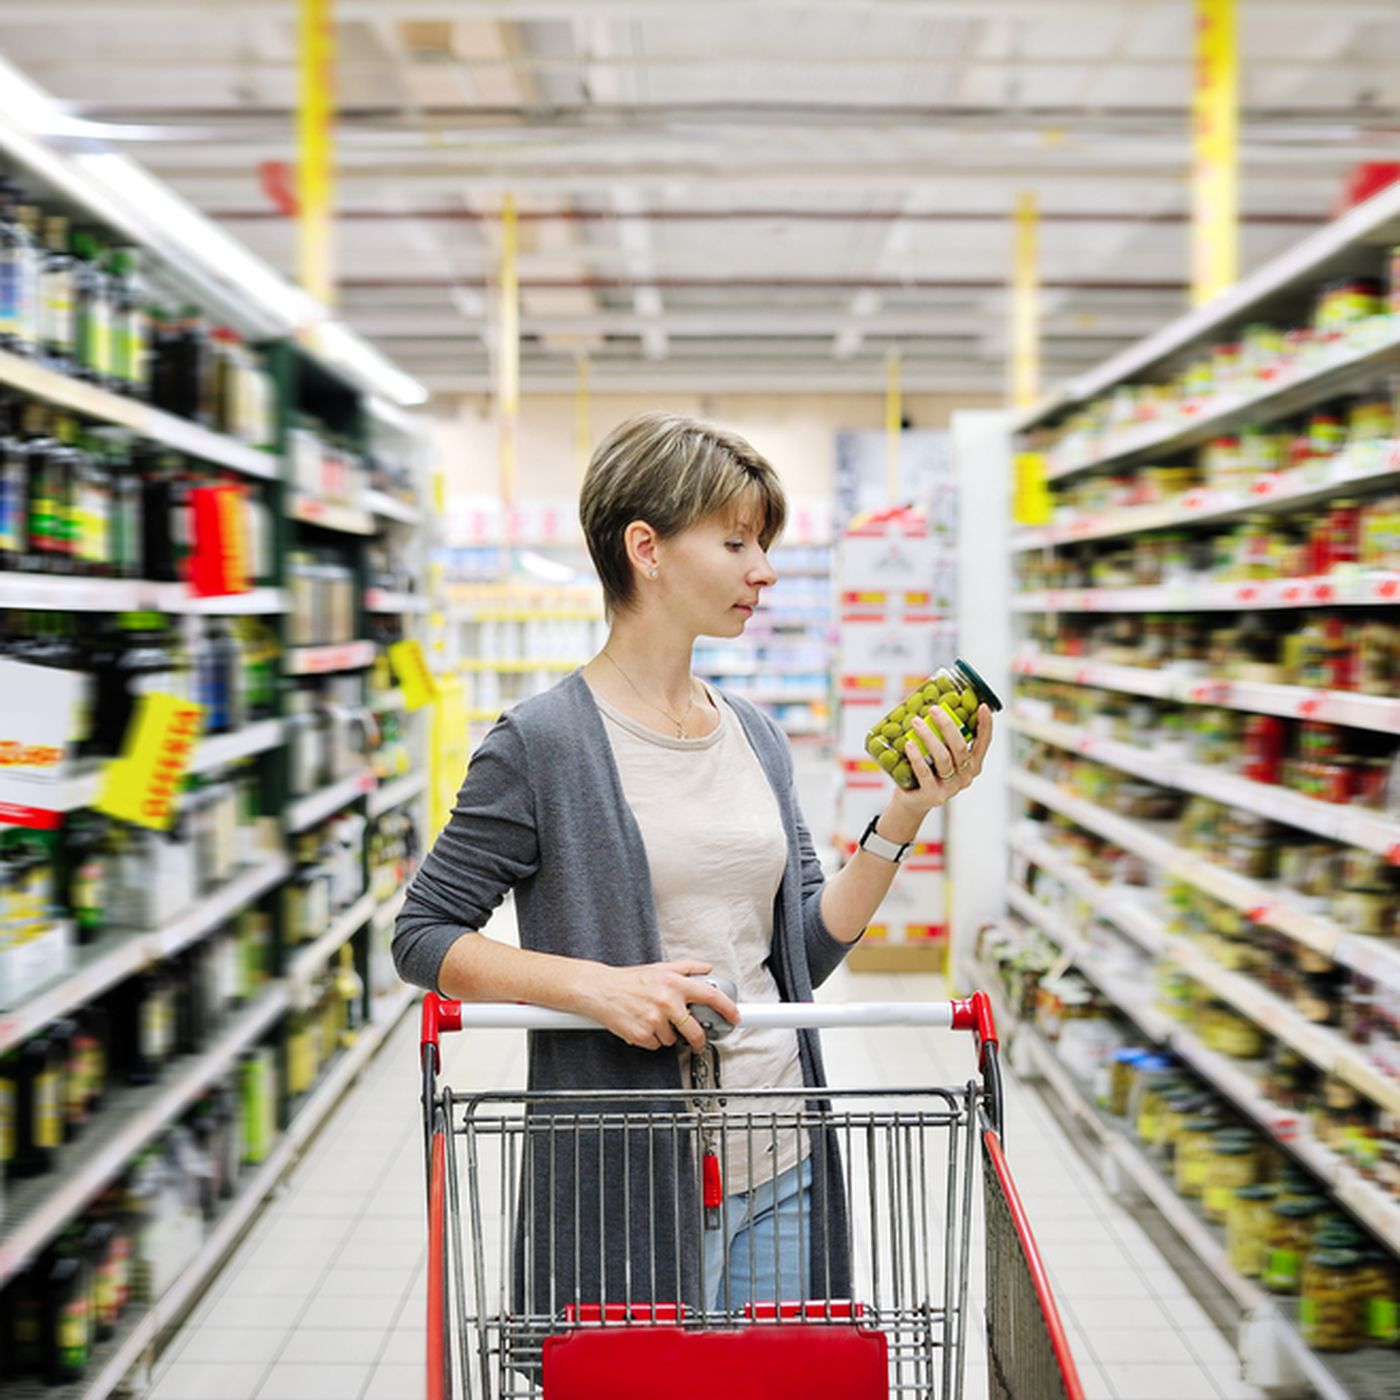 The hidden war over grocery shelf space - Vox